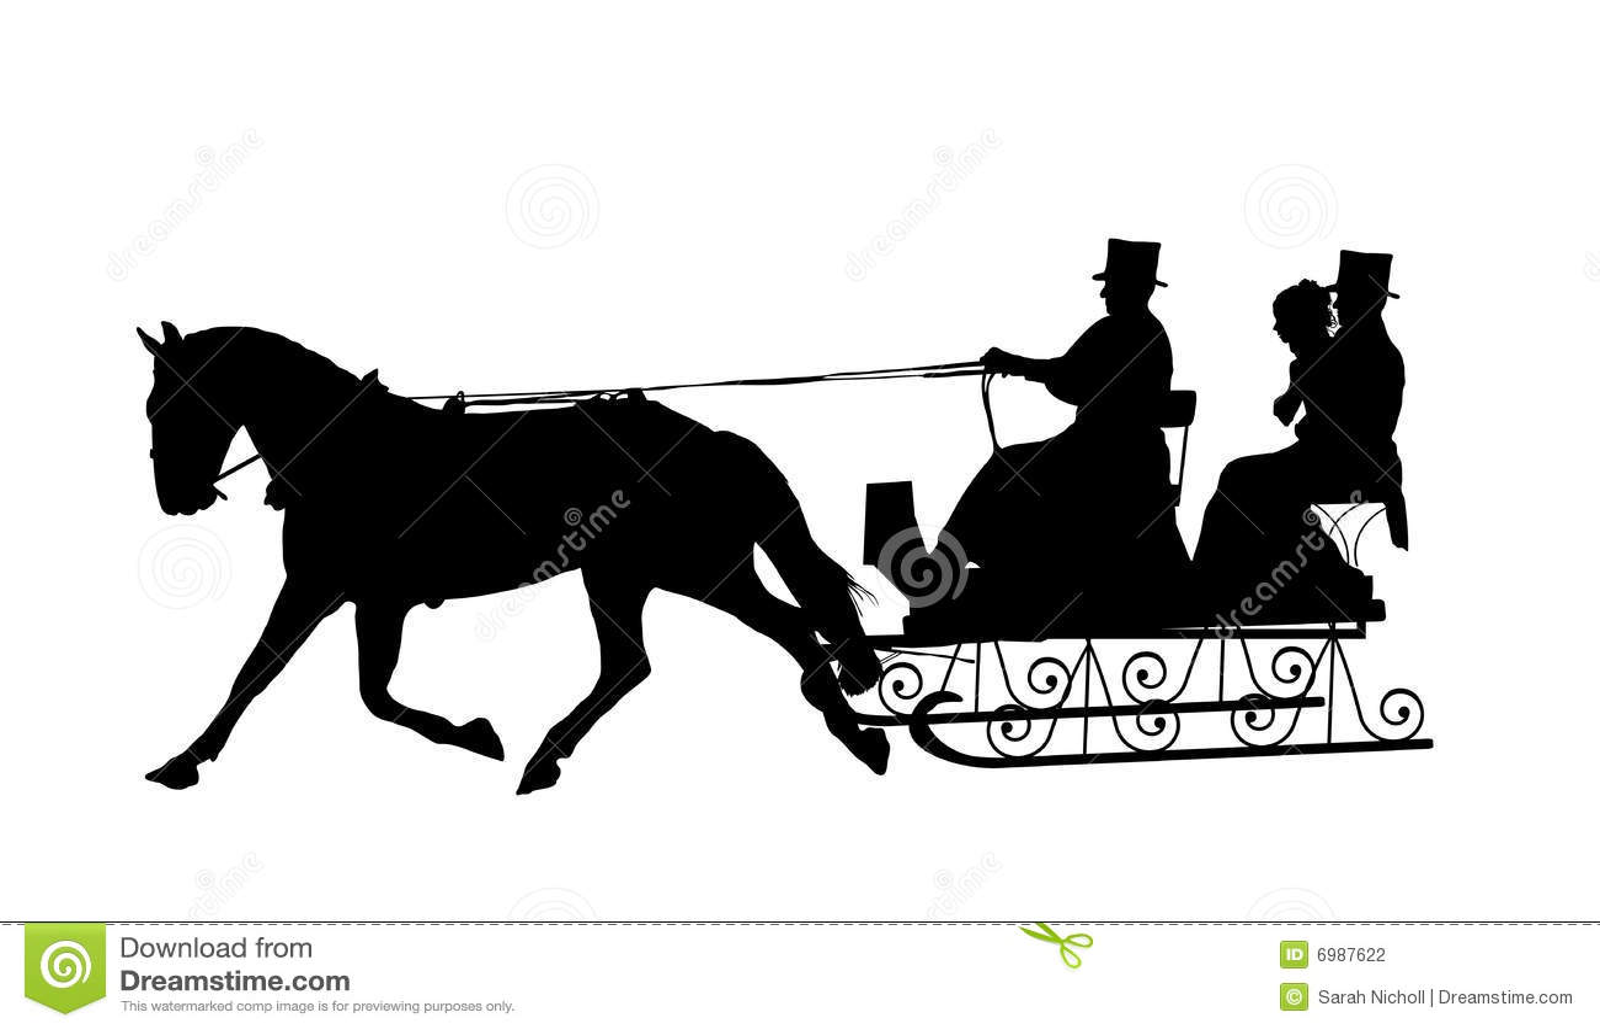 дед мороз на санях с лошадьми картинки силуэт вариант самый